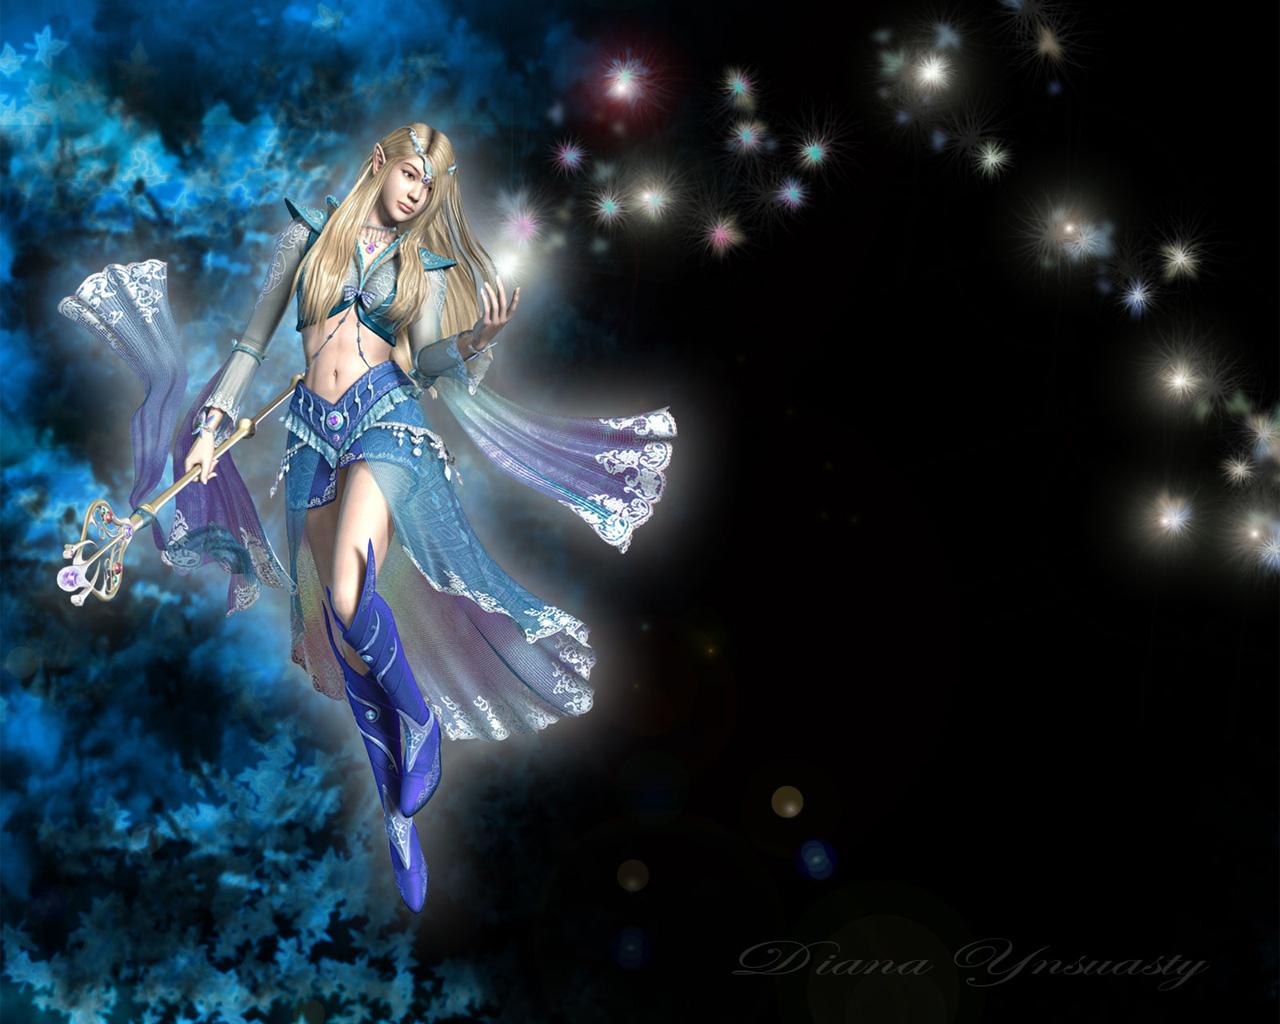 Fairy Computer Wallpapers Desktop Backgrounds 1280x1024 ID19130 1280x1024